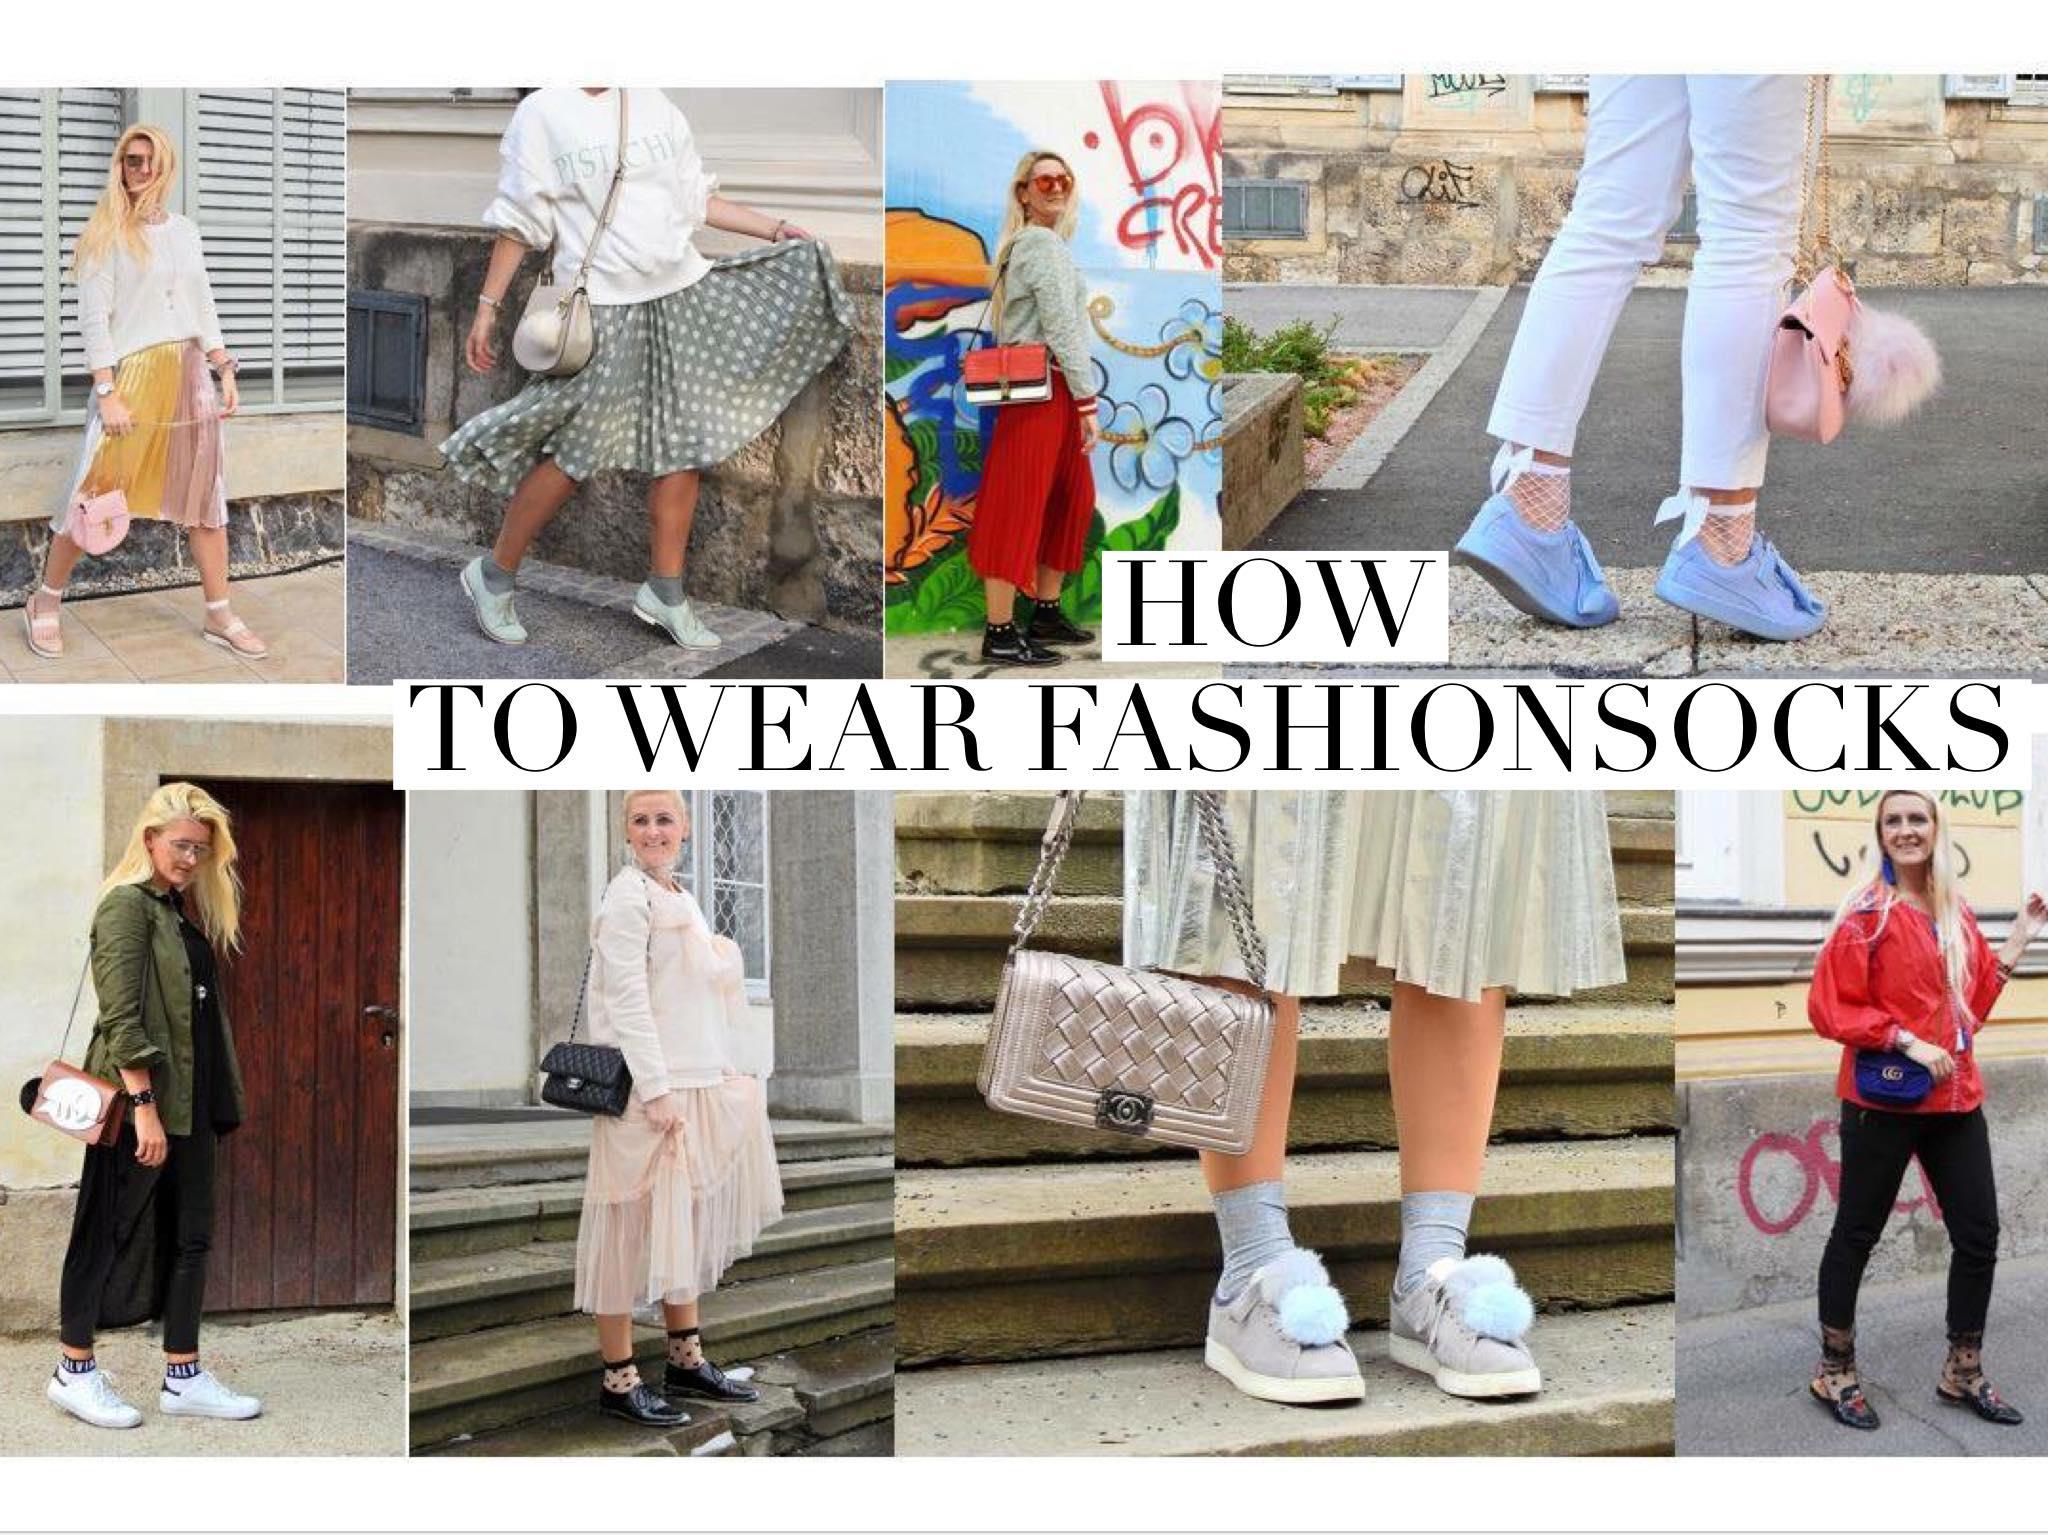 Fashionsocks-Fishnet-Stockings-how-to-wear-carrieslifestyle-Tamara-Prutsch